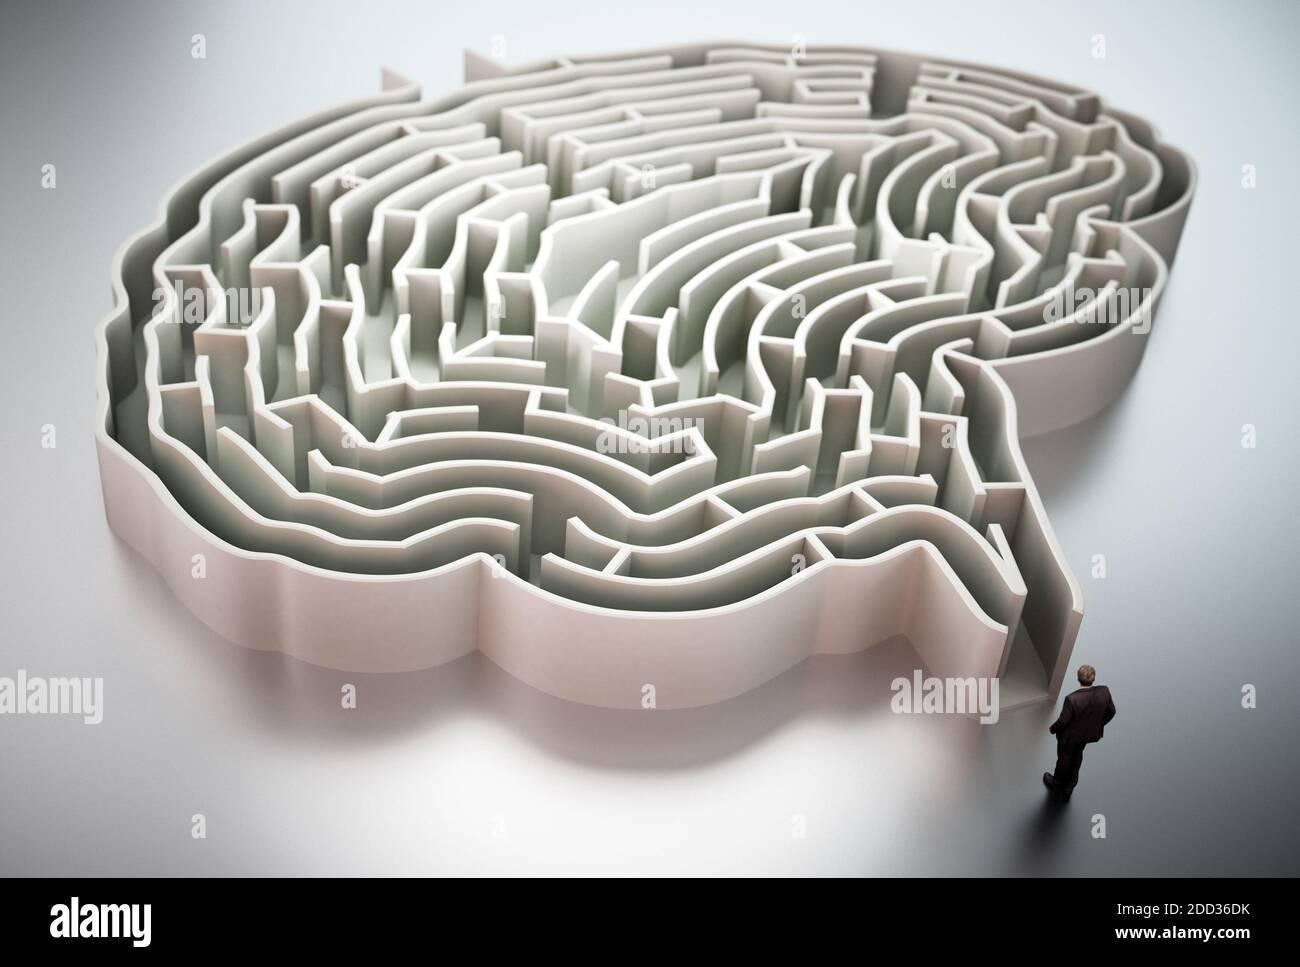 Geschäftsmann steht am Eingang des hirnförmigen Labyrinth 3D-Illustration. Stockfoto